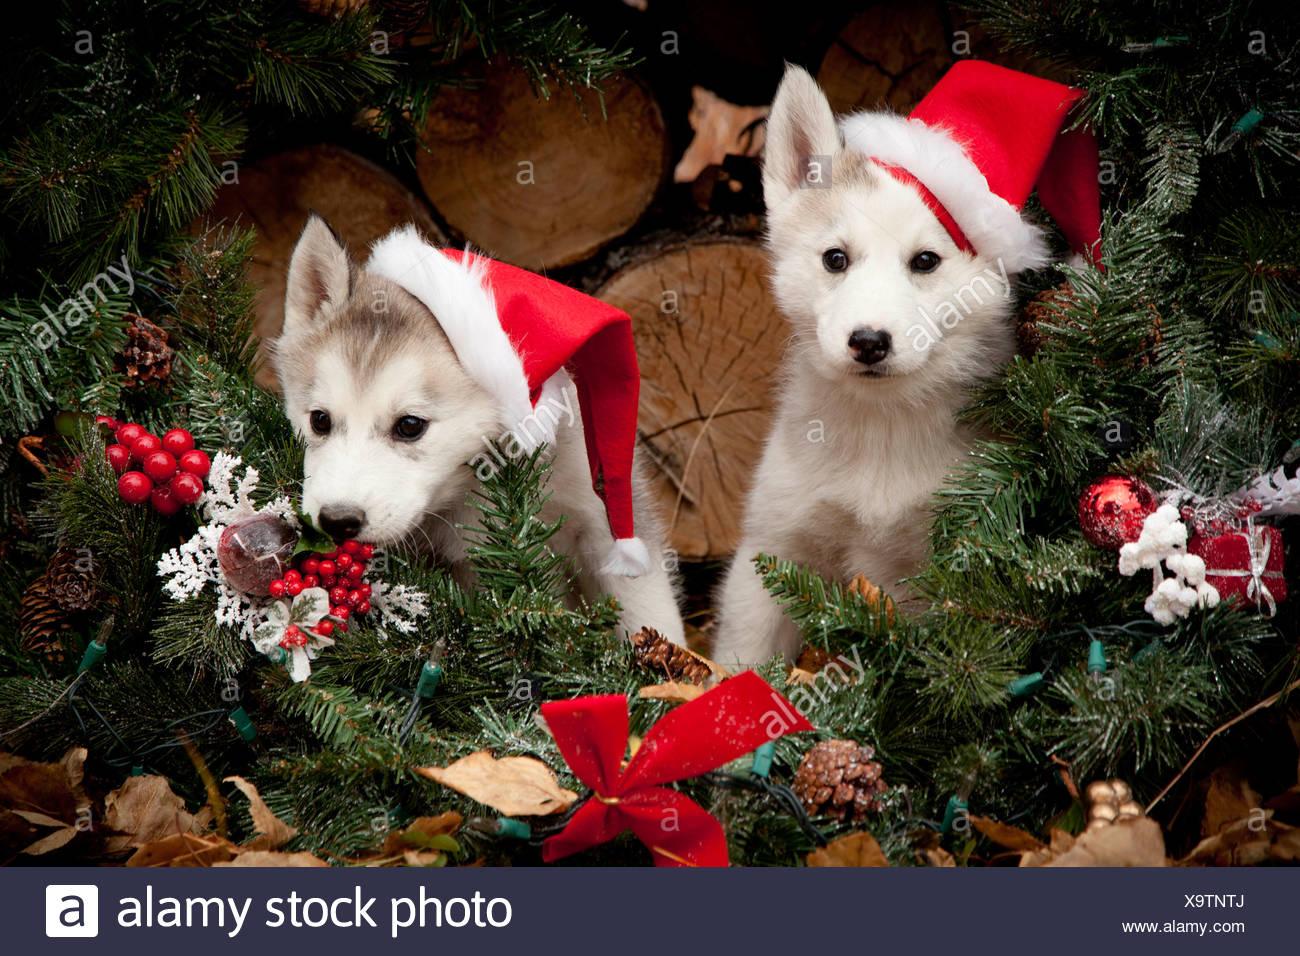 Husky Christmas Puppy.Siberian Husky Puppies Wearing Santa Hats Sit Inside A